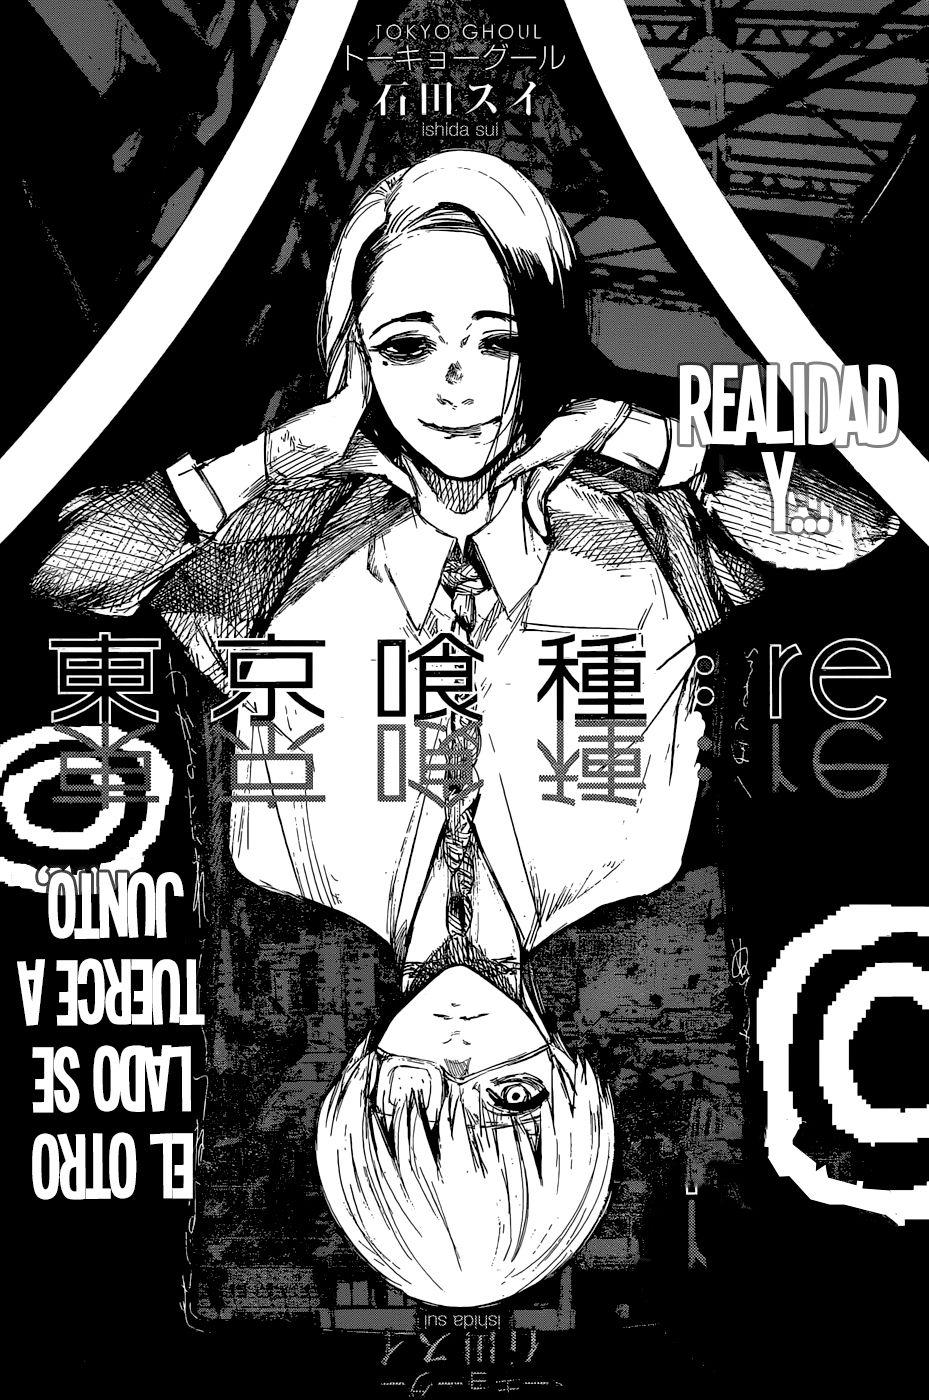 http://c5.ninemanga.com/es_manga/pic2/59/59/516653/f839f8e855486b52f72d40cbbd80b5fd.jpg Page 1